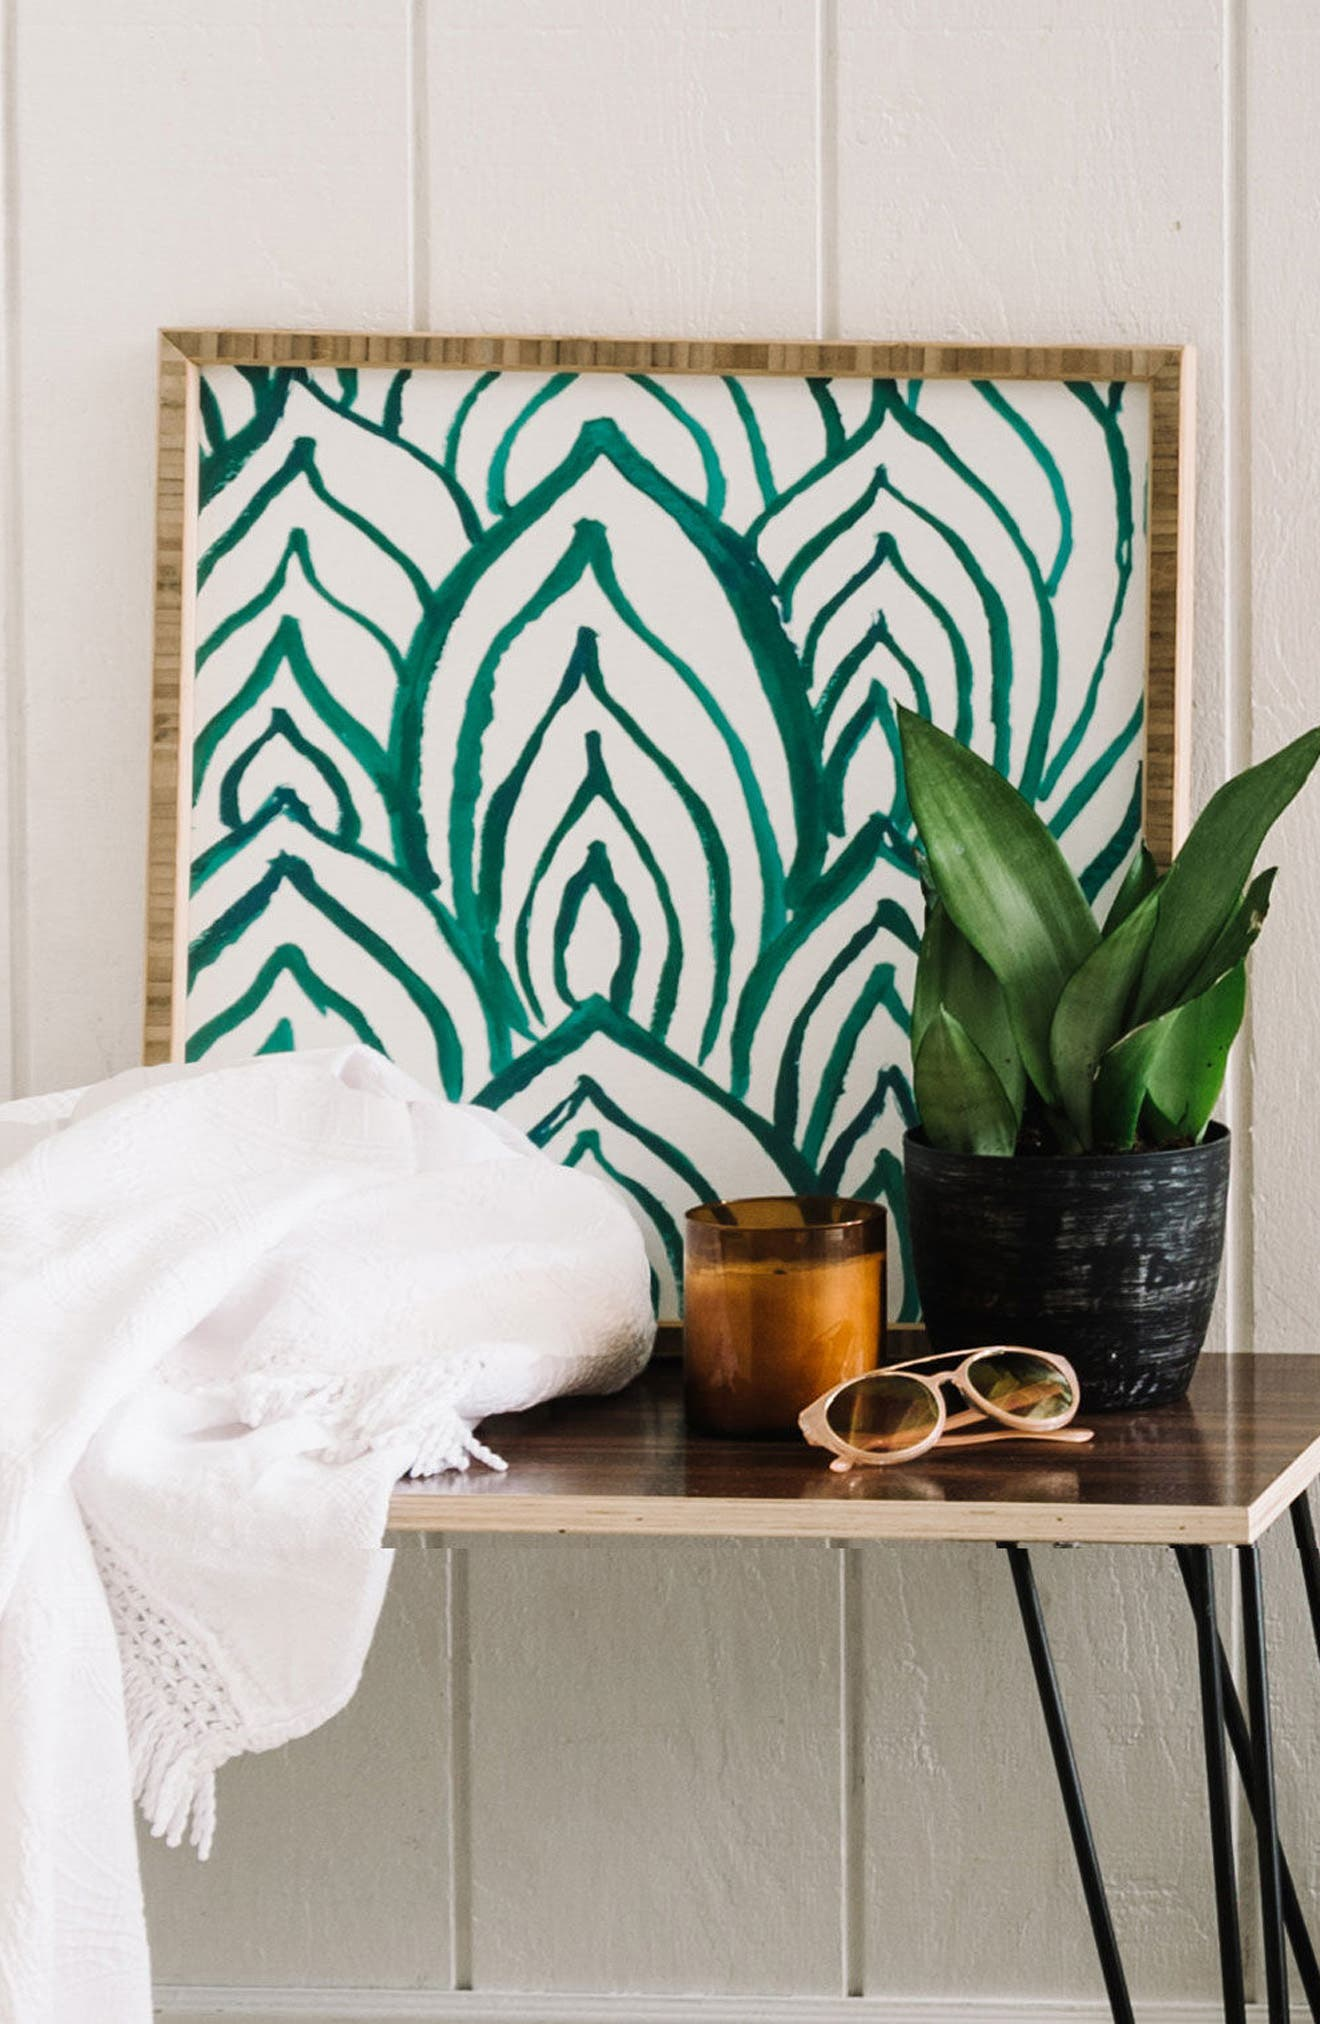 DENY DESIGNS, 'Emerald Coast' Framed Wall Art, Alternate thumbnail 4, color, 300